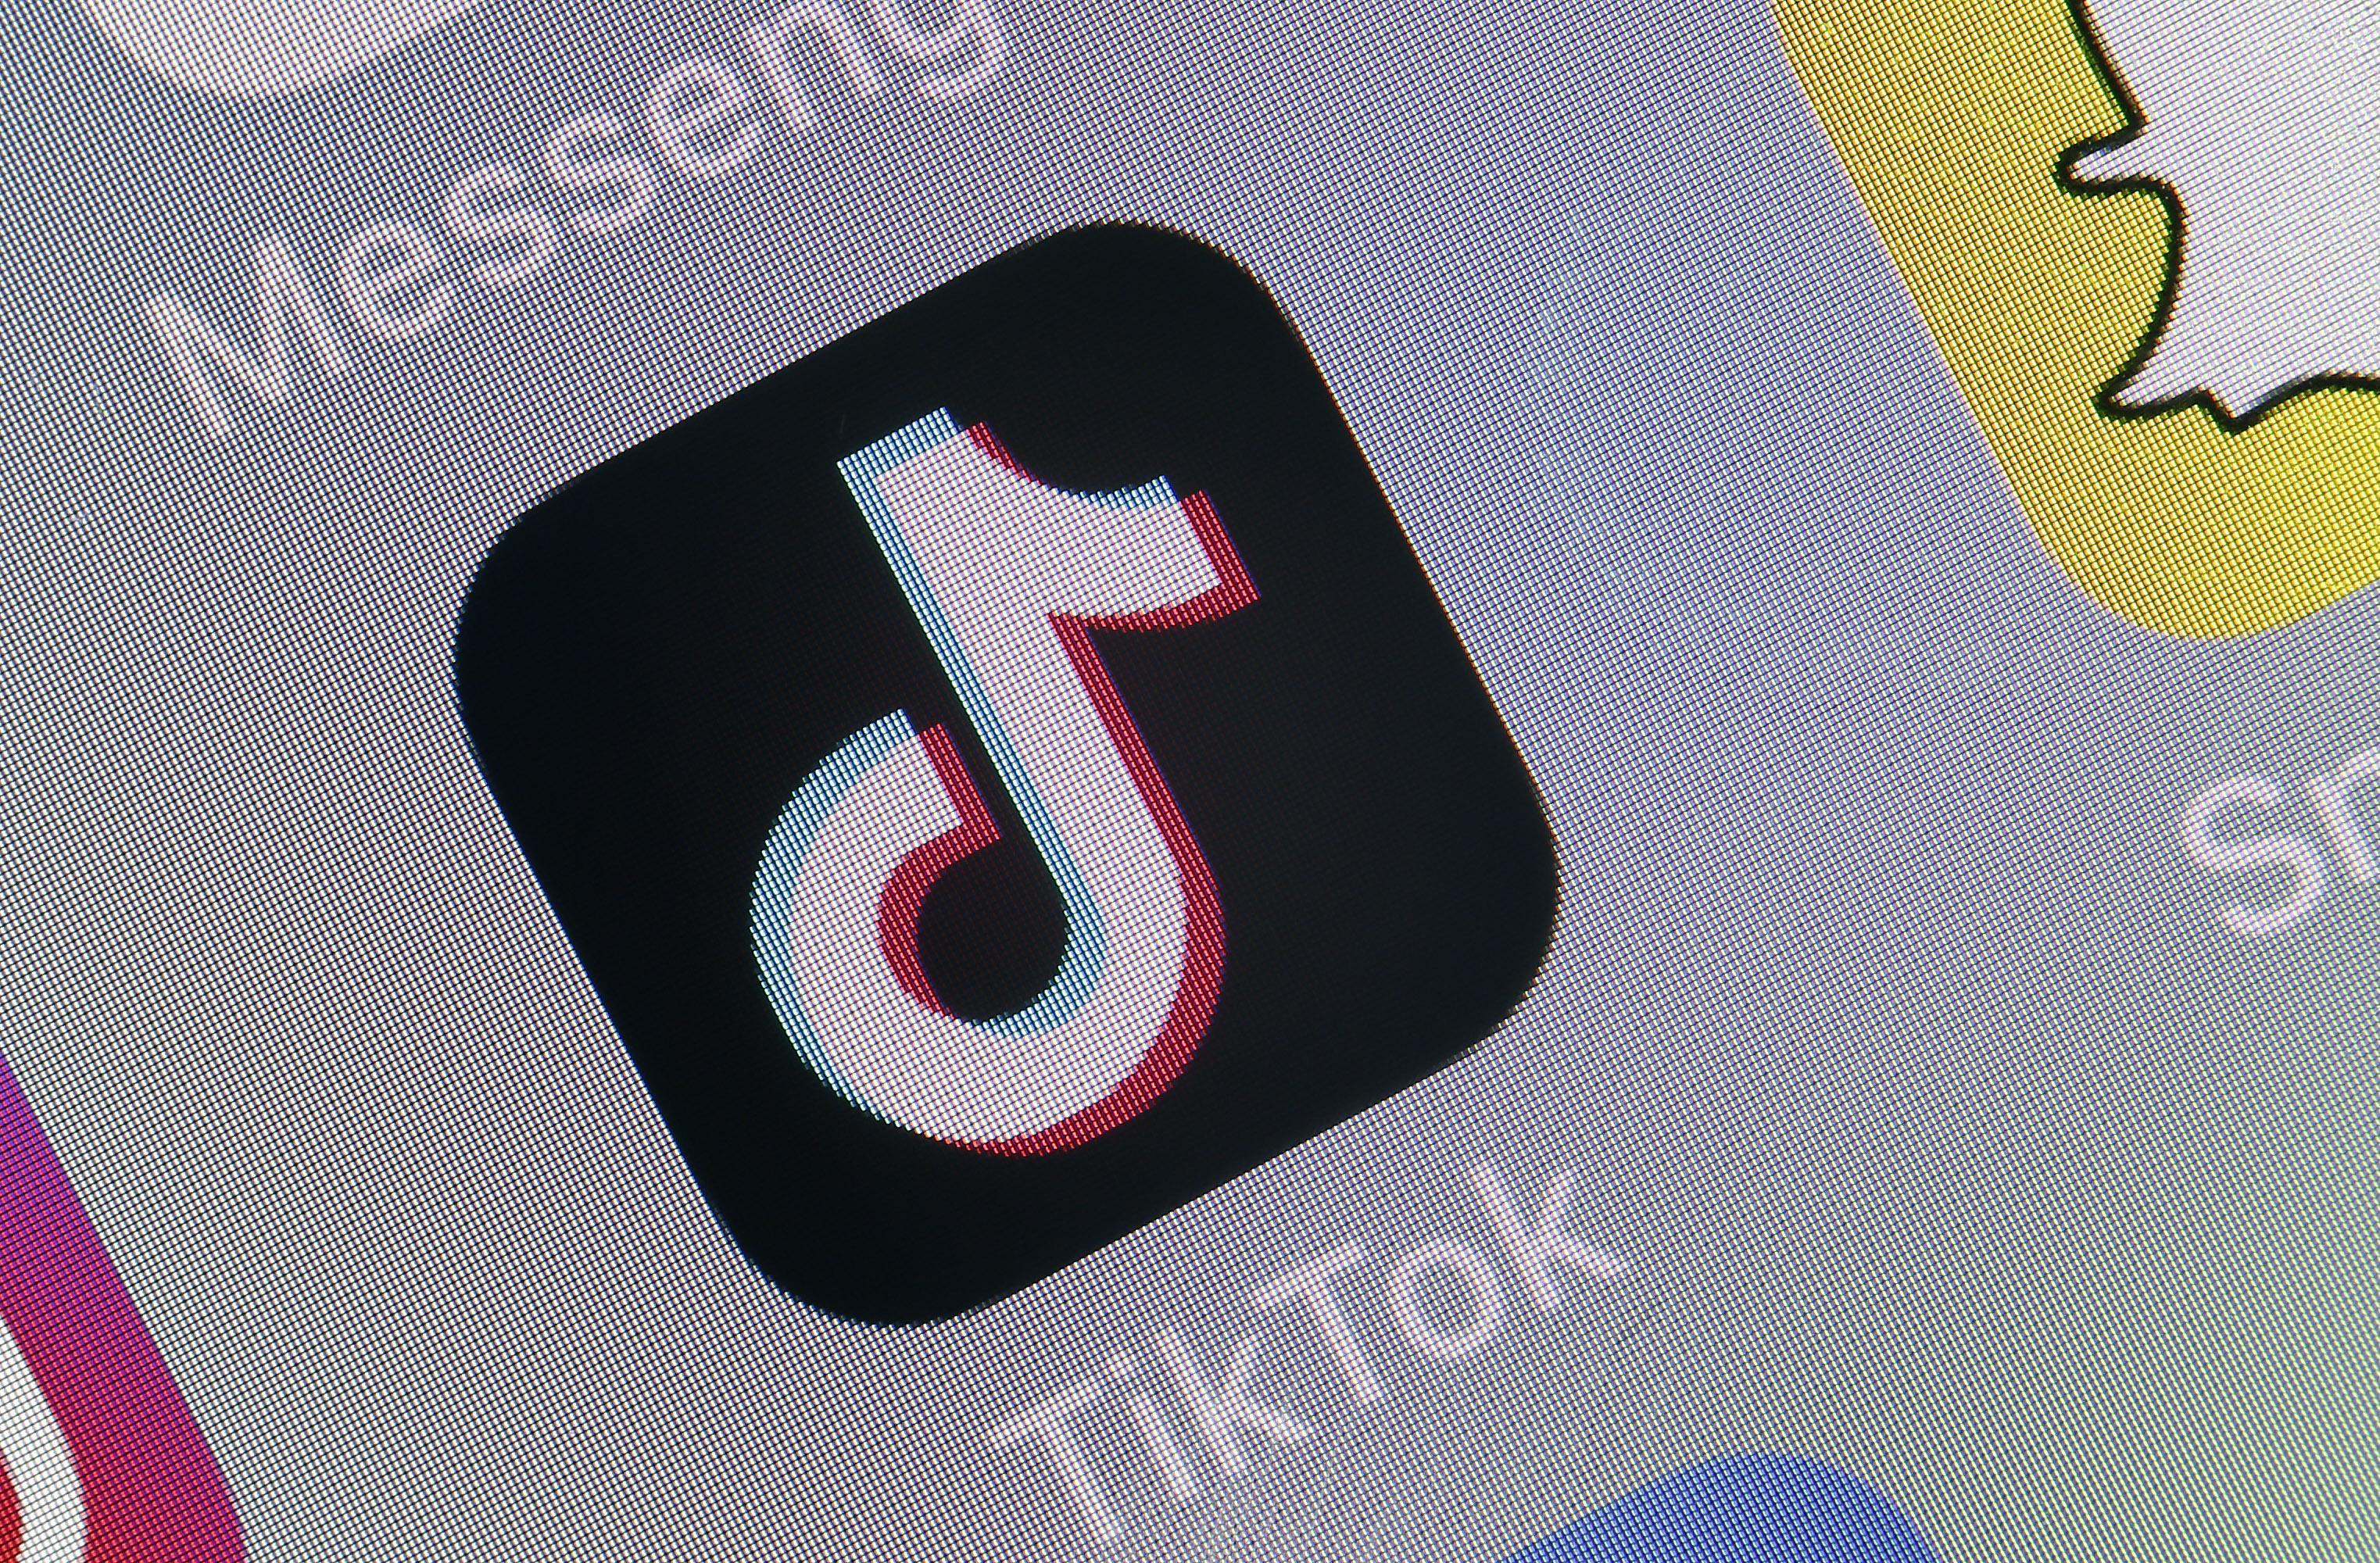 TikTok violates Federal Trade Commission rules, pays $5 7 million